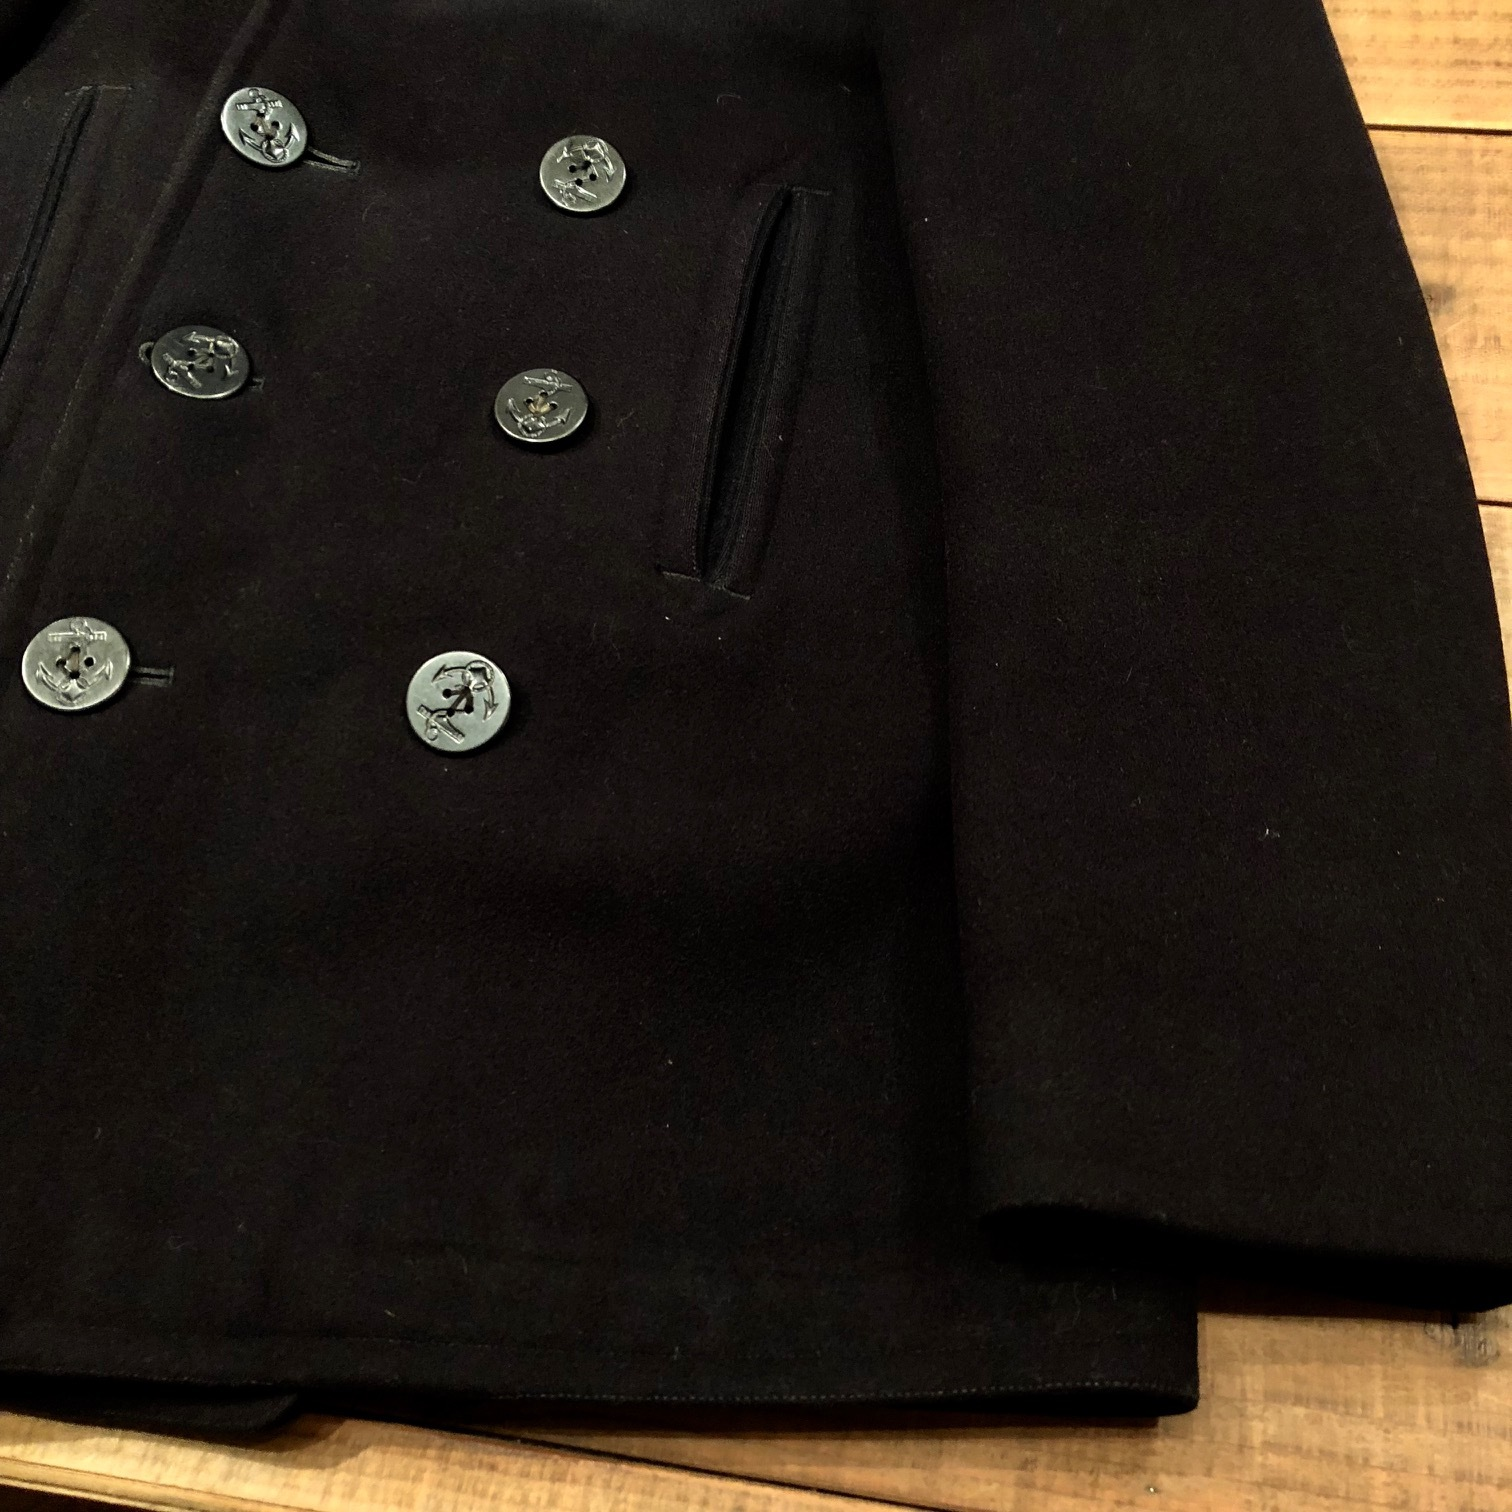 "1940s \"" U.S NAVAL CLOTHING FACTORY \"" - ALL Melton WOOL - Vintage 10 BUTTON P-COAT ._d0172088_17304075.jpg"